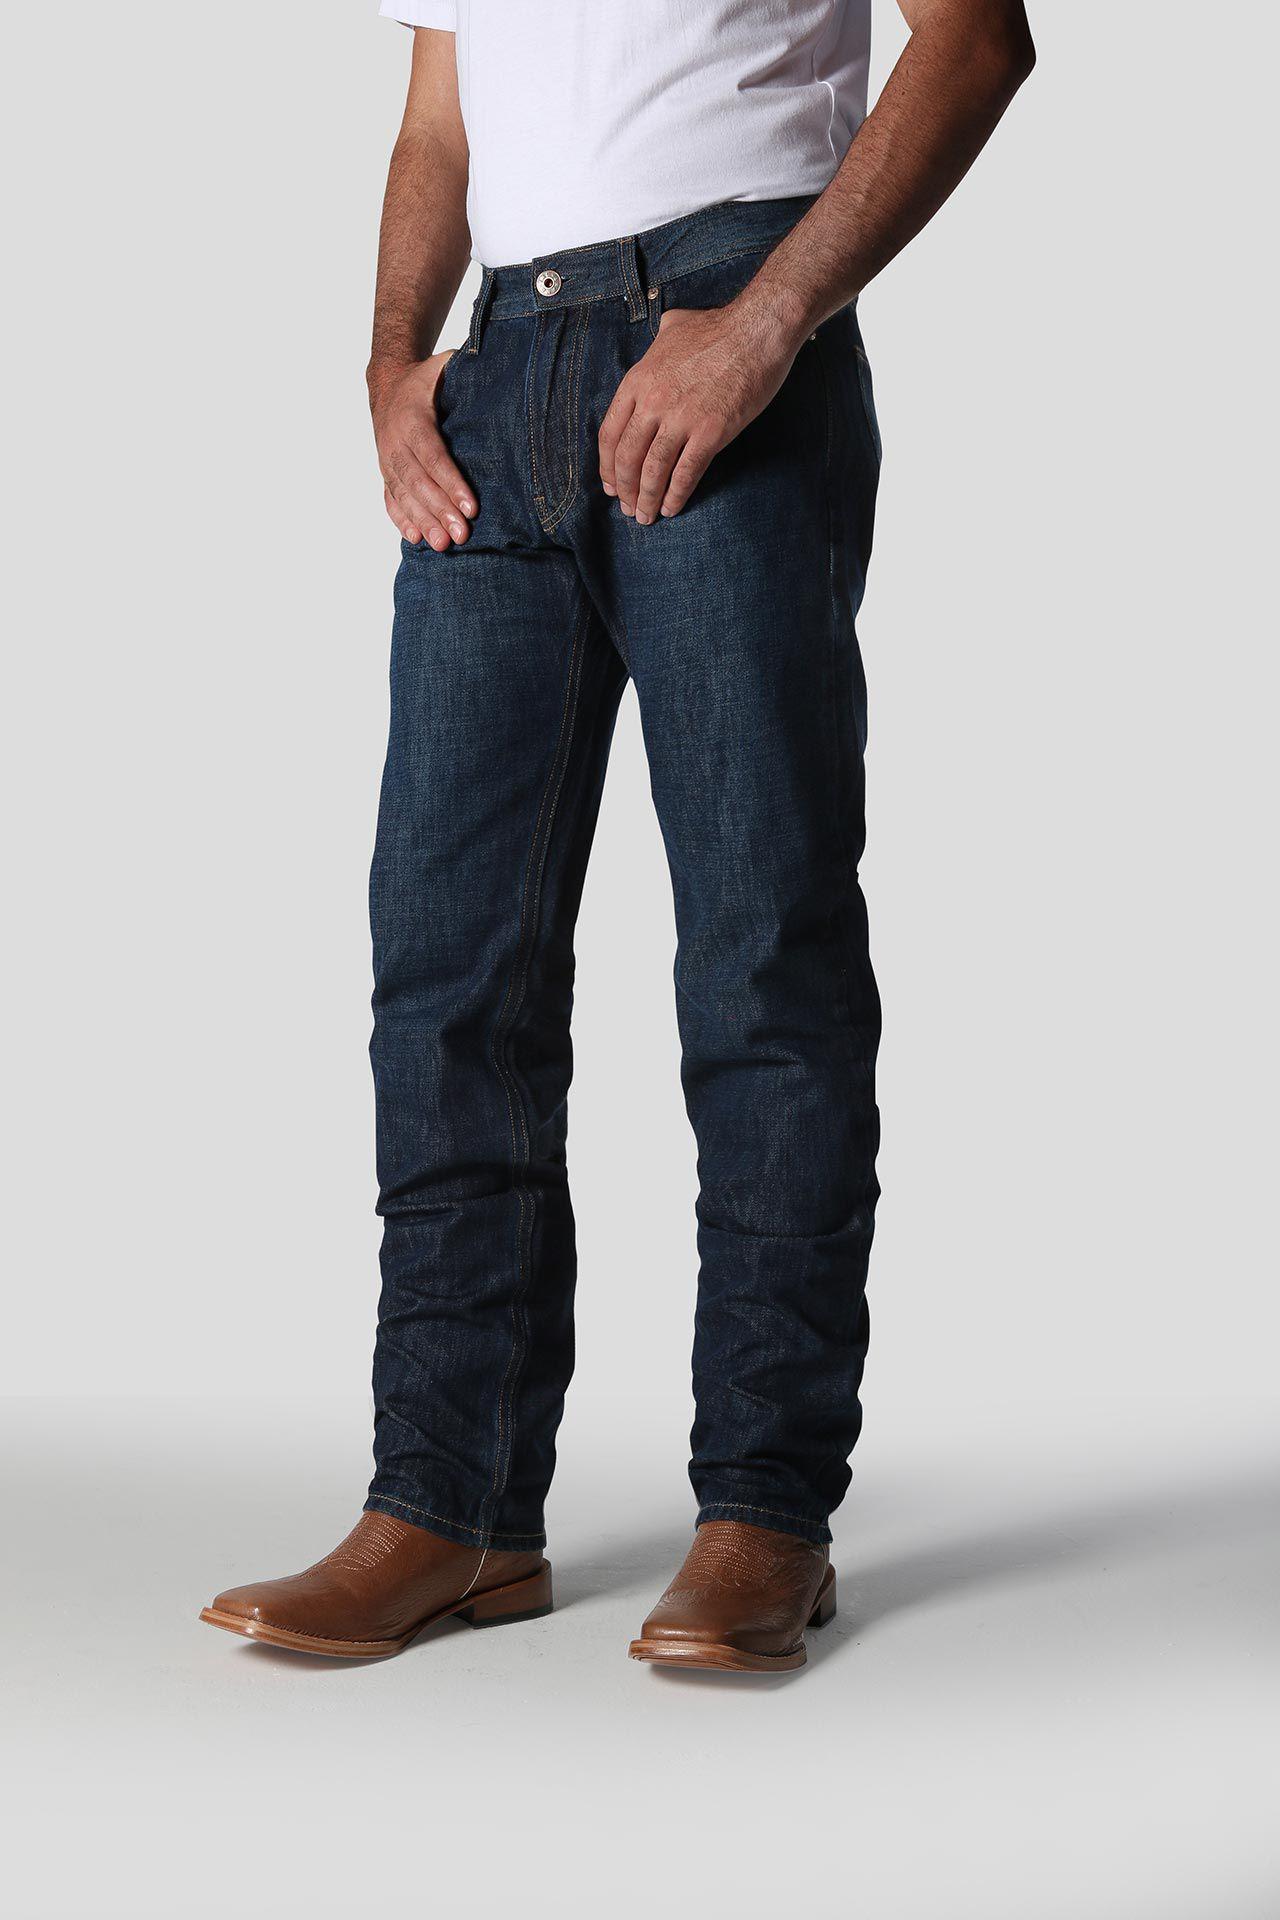 Calça Jeans TXC Masculina X1 BLACK